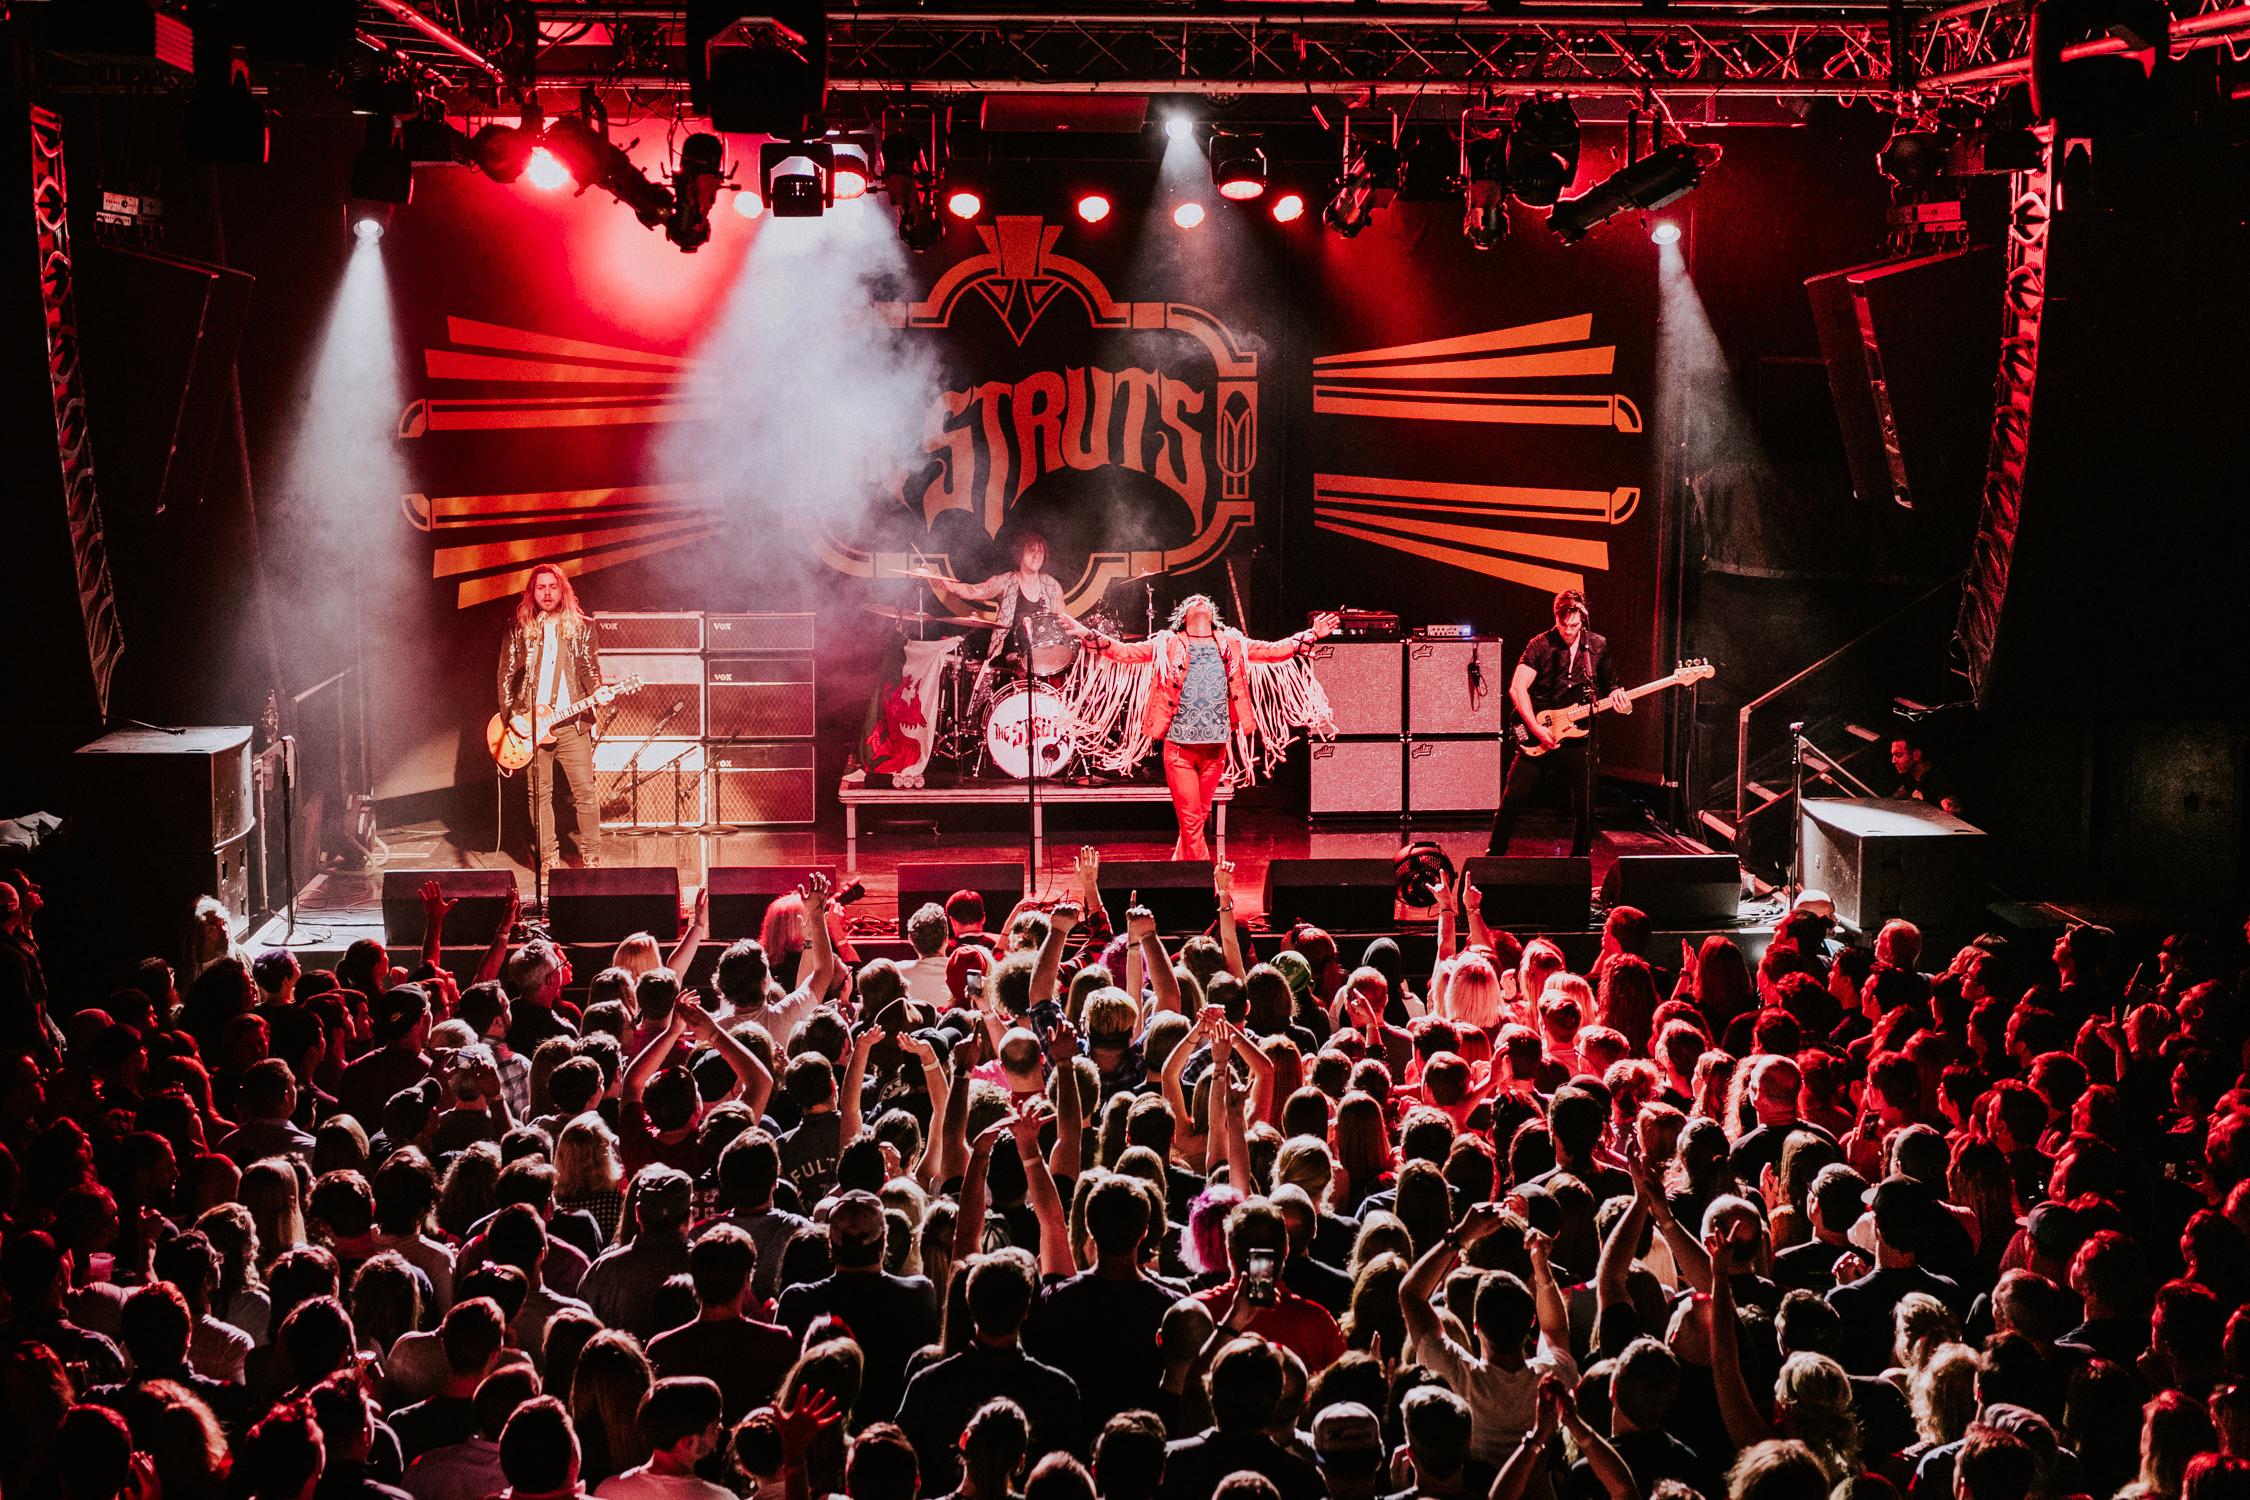 struts-live-show-crowd-AnnaLeeMedia